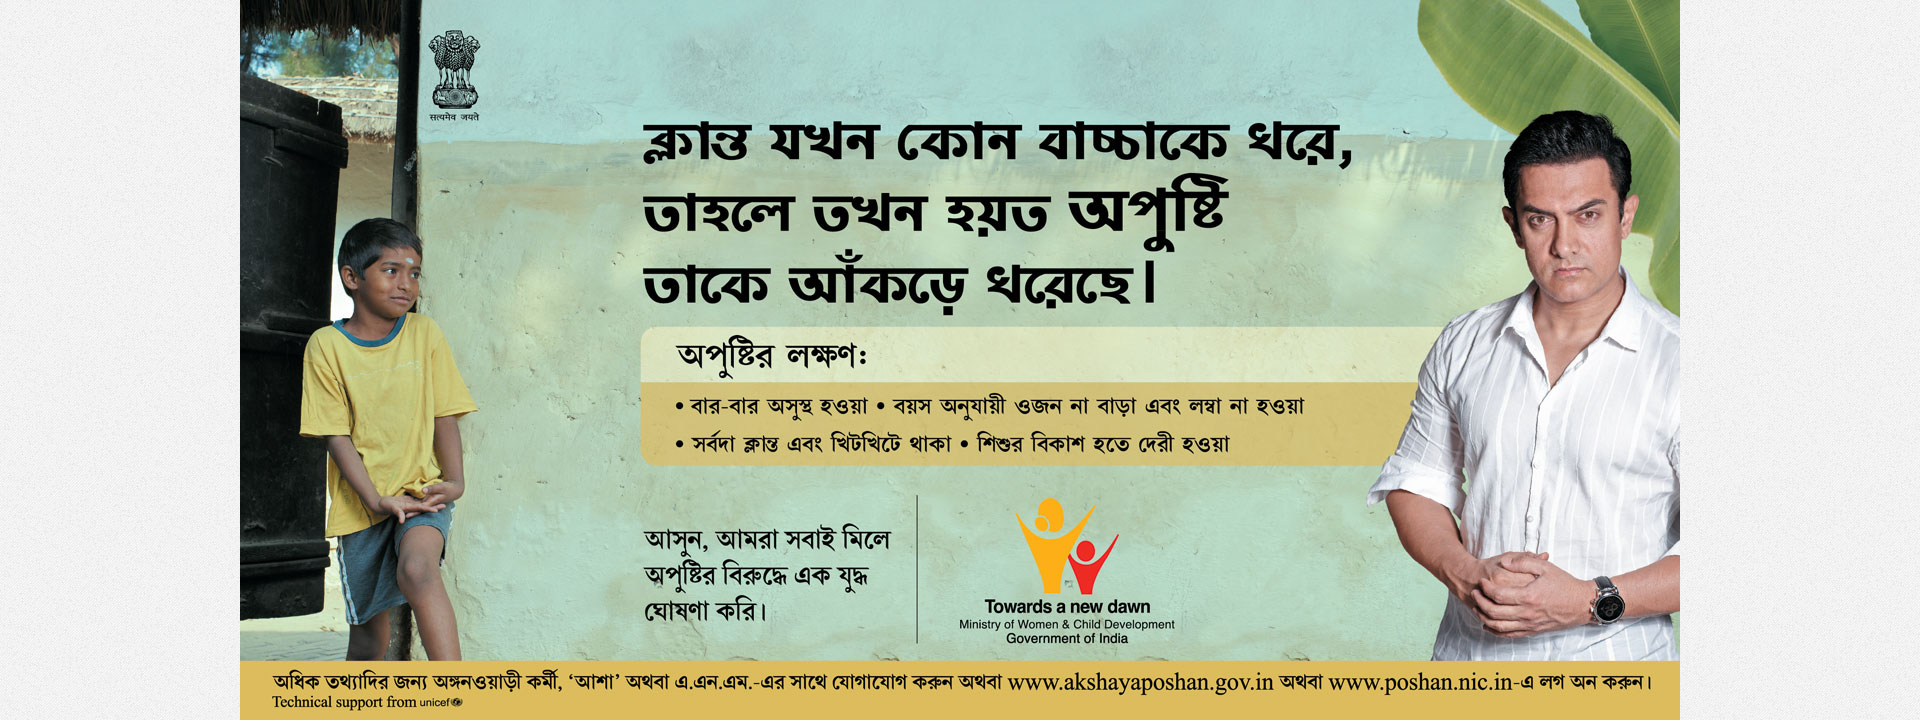 Bengali - Bangla - বাংলা | Poshan | Nutrition, Food